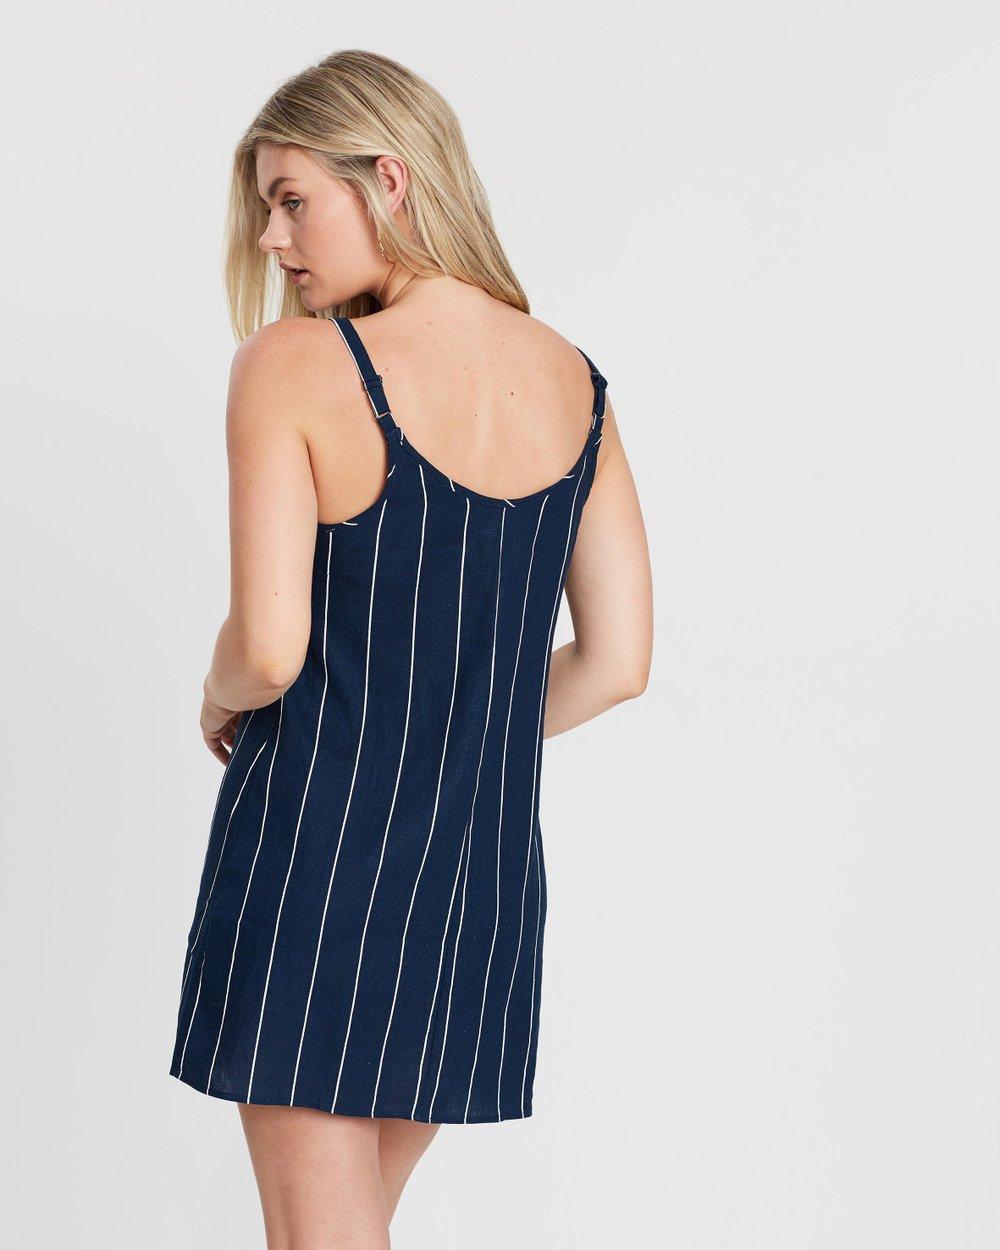 788dba3736f Woven Margot Slip Dress by Cotton On Online